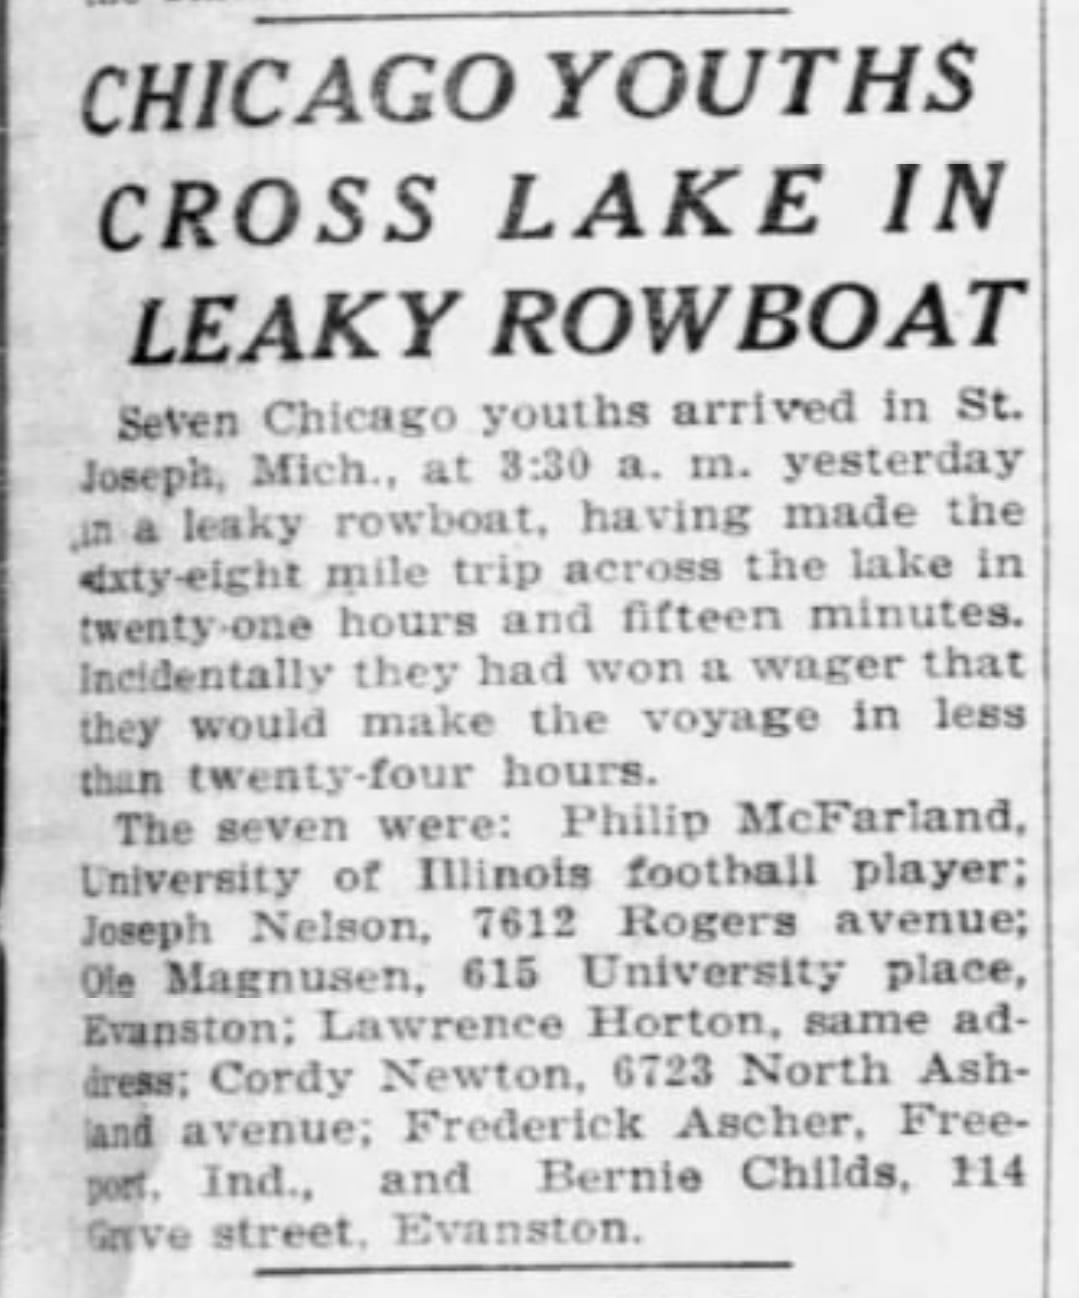 Cross Lake Michigan in leaky boat, news clip